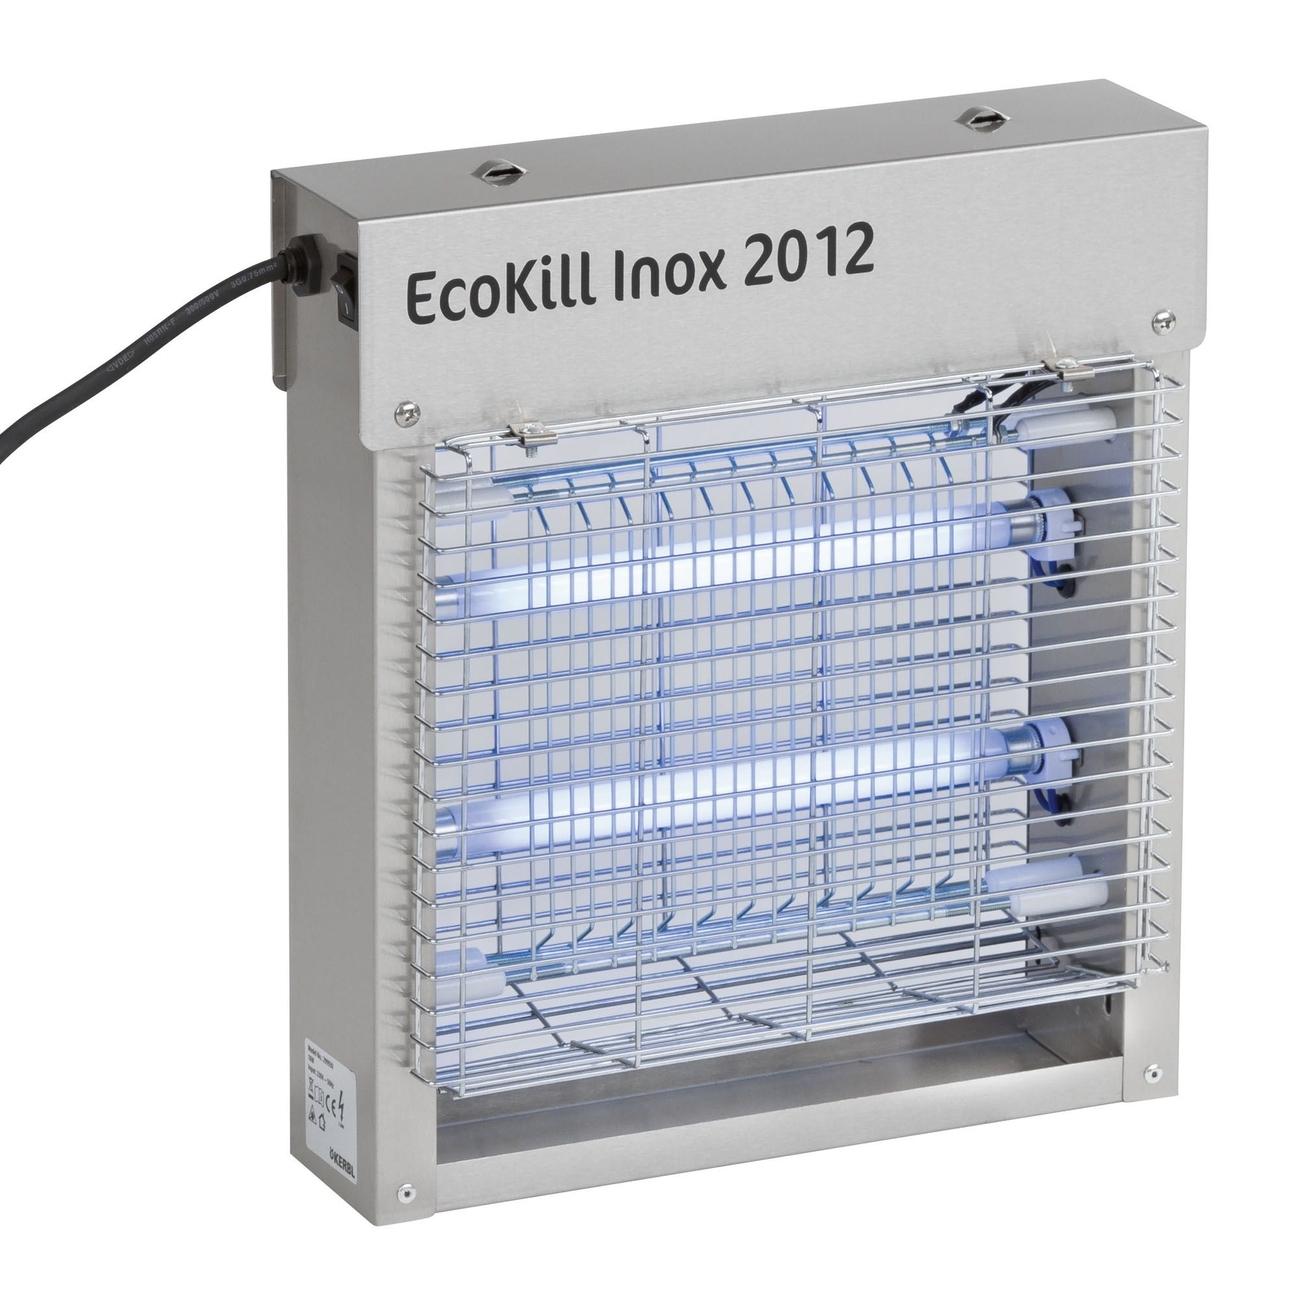 Kerbl Fliegenvernichter EcoKill Inox